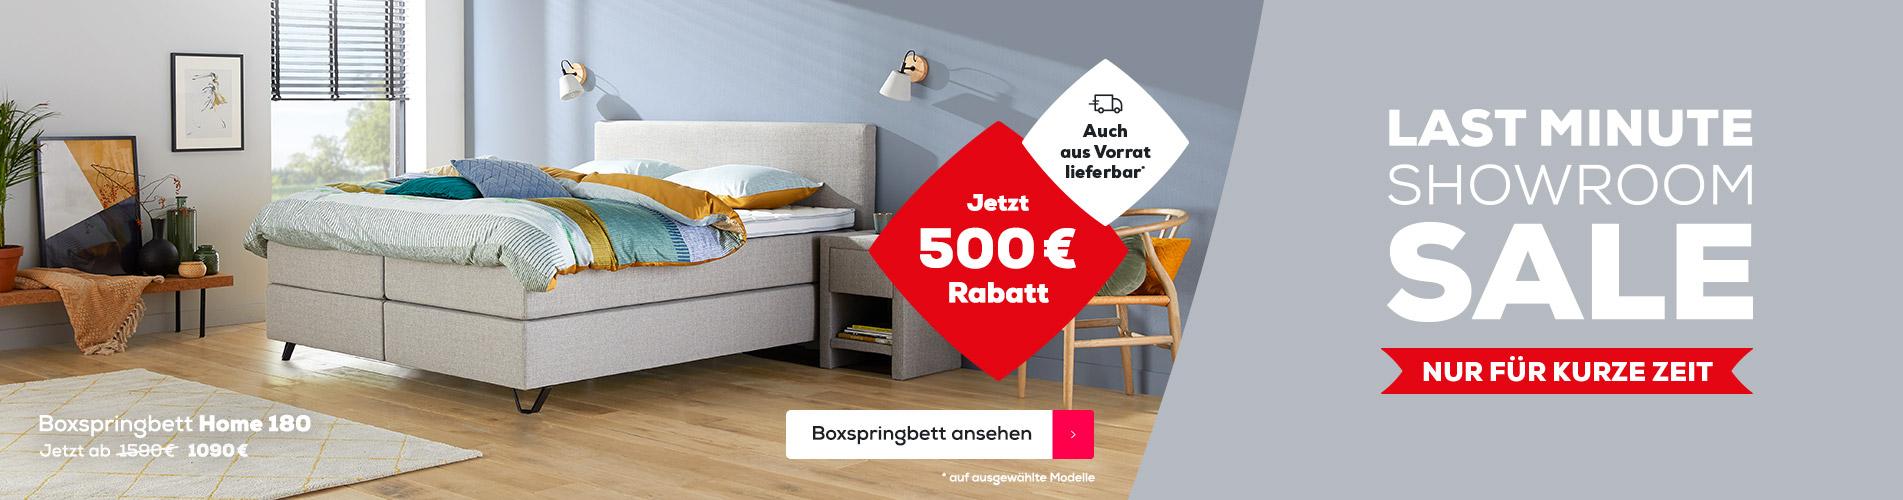 Boxspringbett Home 180 - LMSS | Swiss Sense